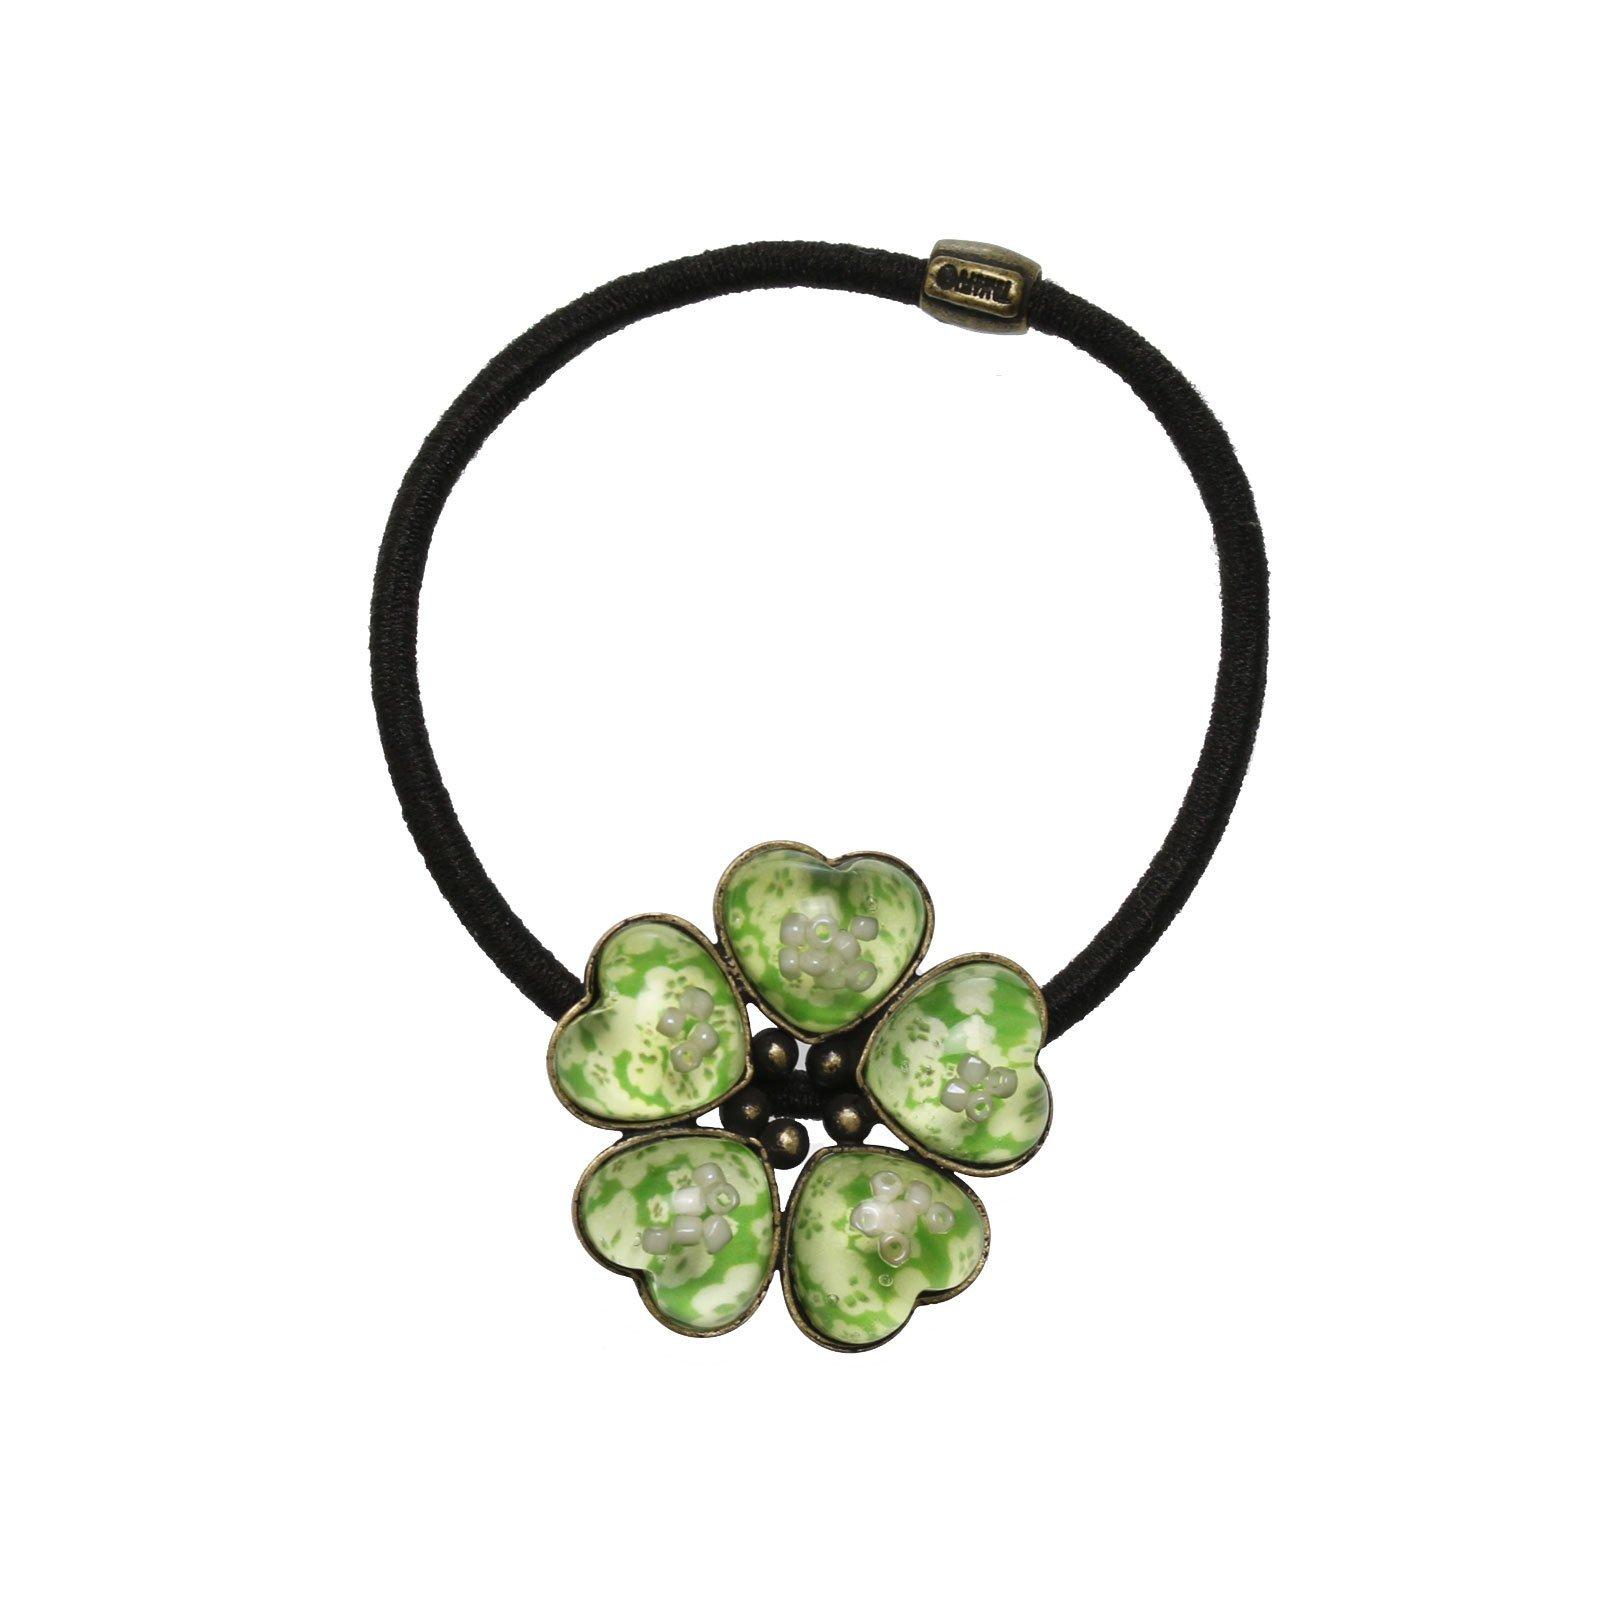 Tamarusan Green Plum Flower Pattern Ponytail Holder Hand Made